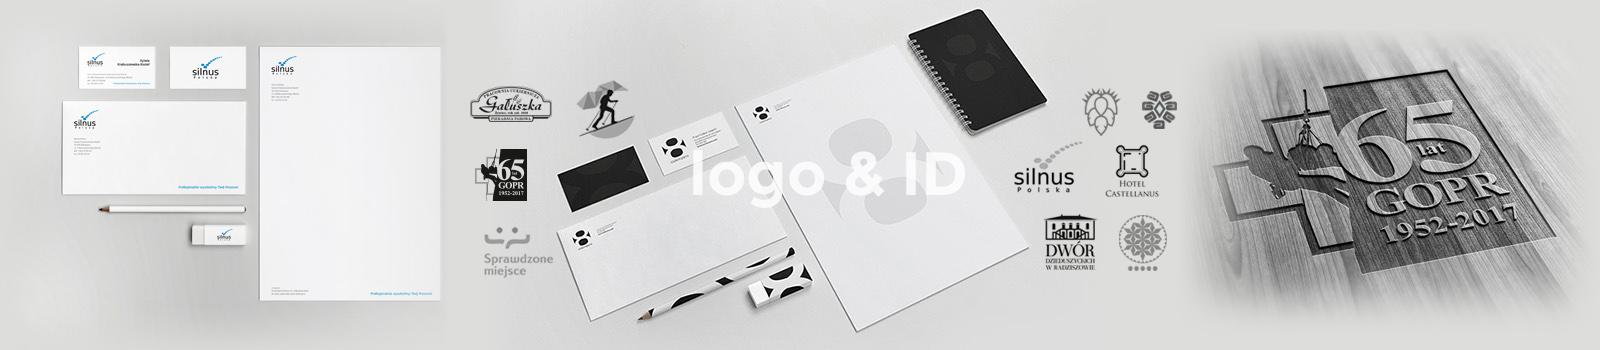 Osiemzero-logo___